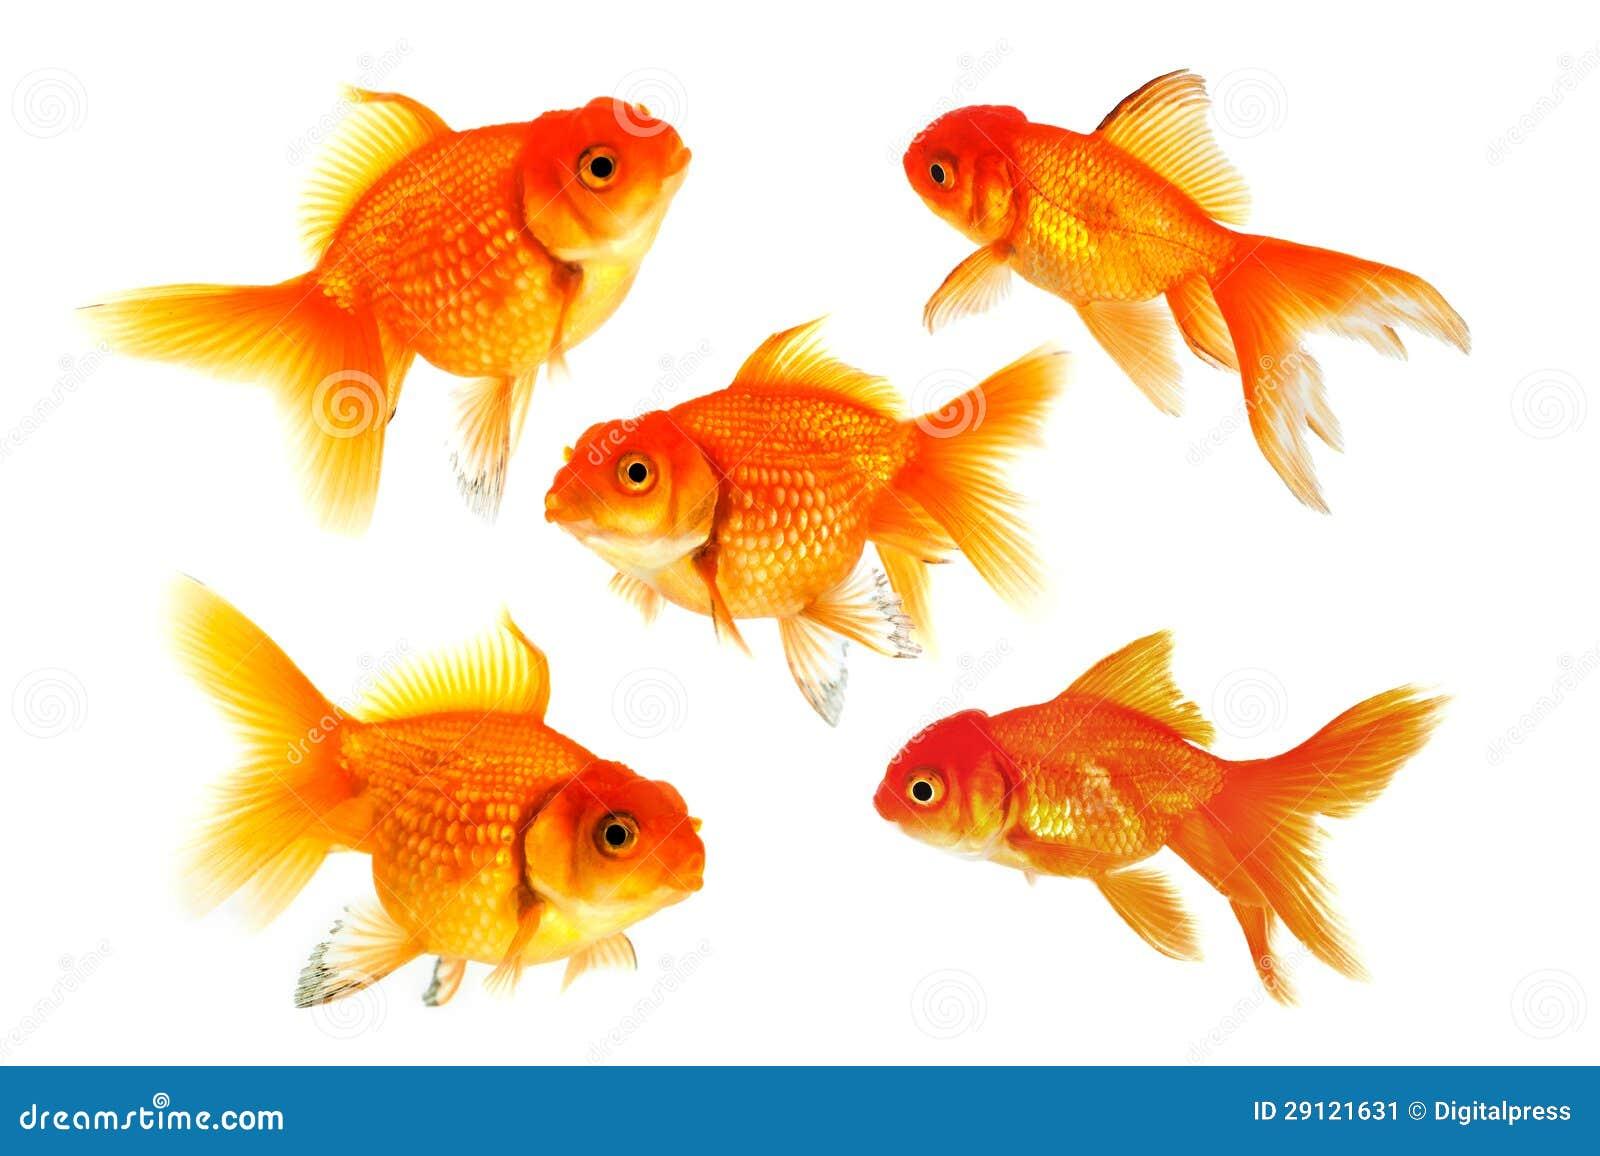 Groupe du poisson rouge image stock image 29121631 for Poisson rouge achat